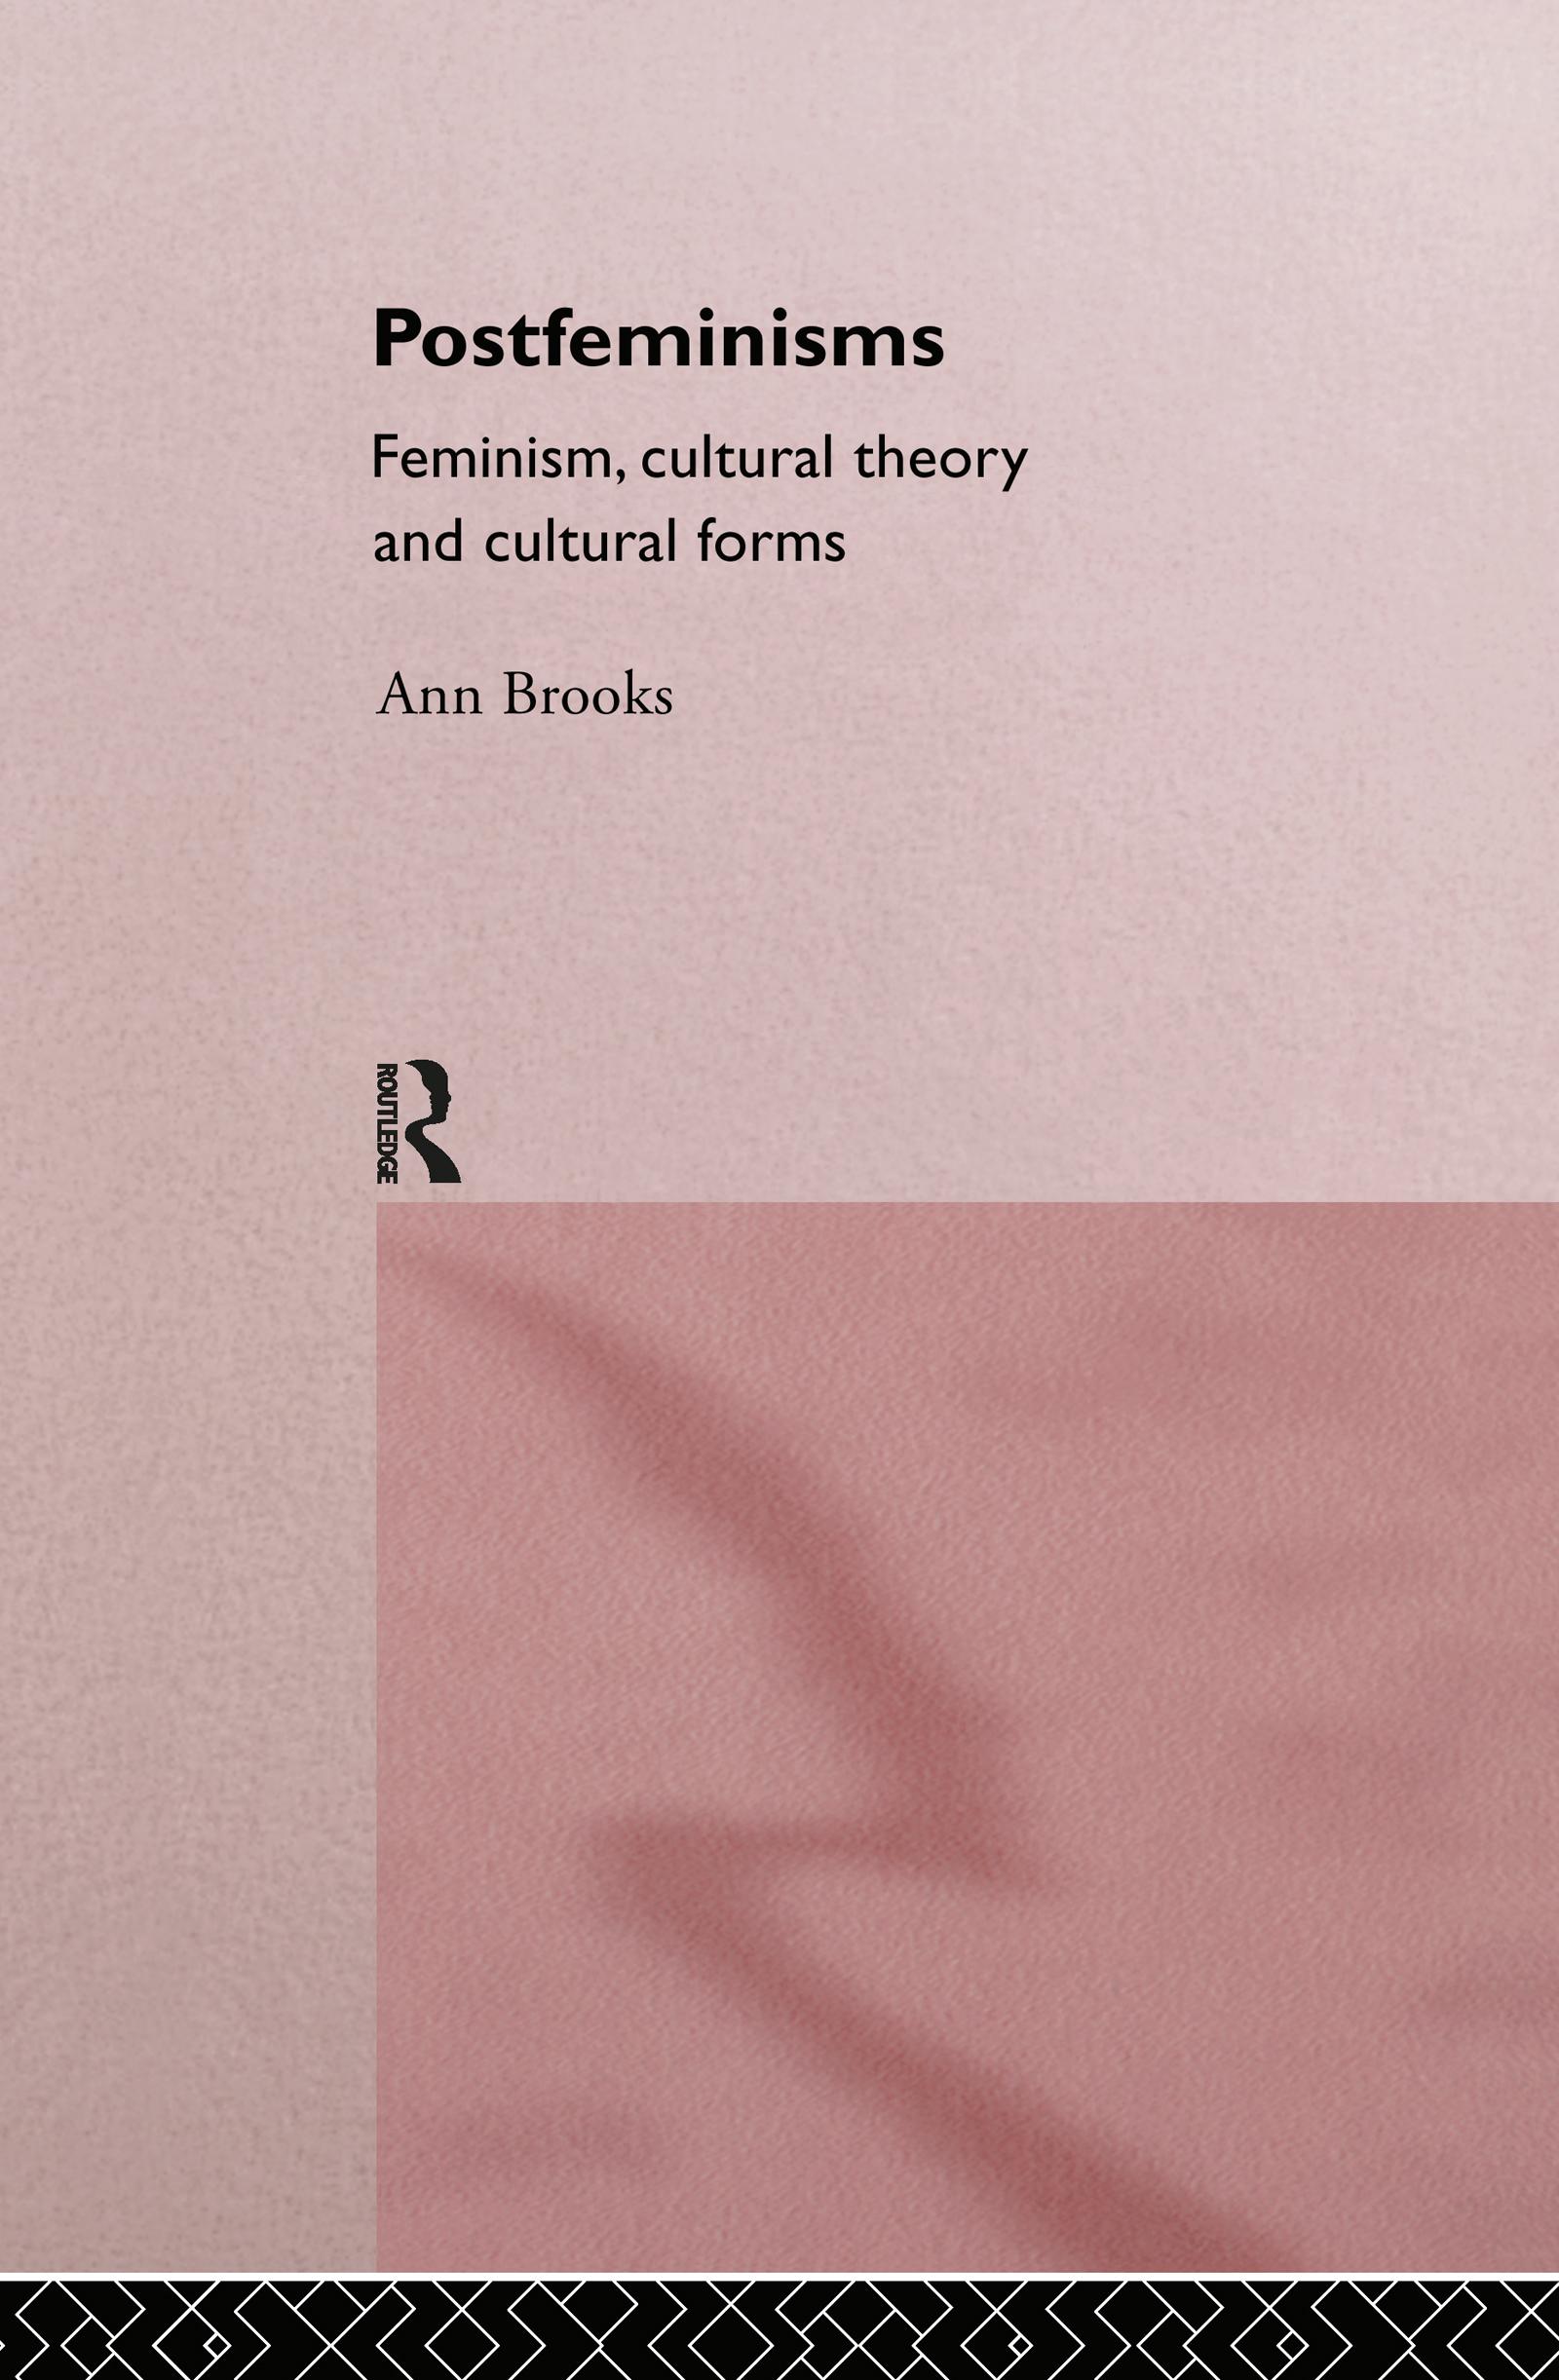 Postfeminisms